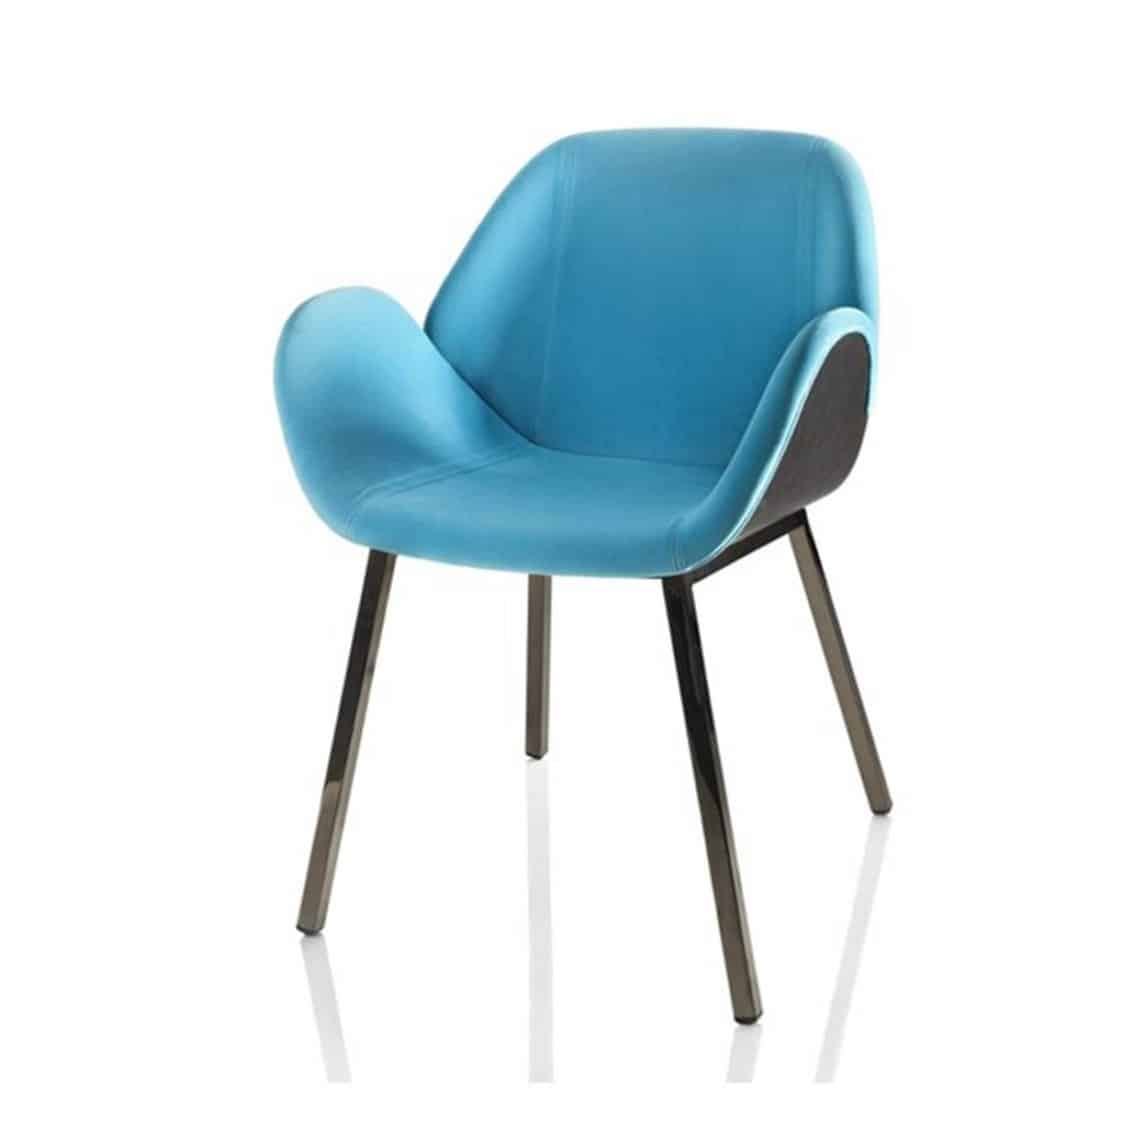 Angel Armchair Lips Alma Design DeFrae contract furnirure blue